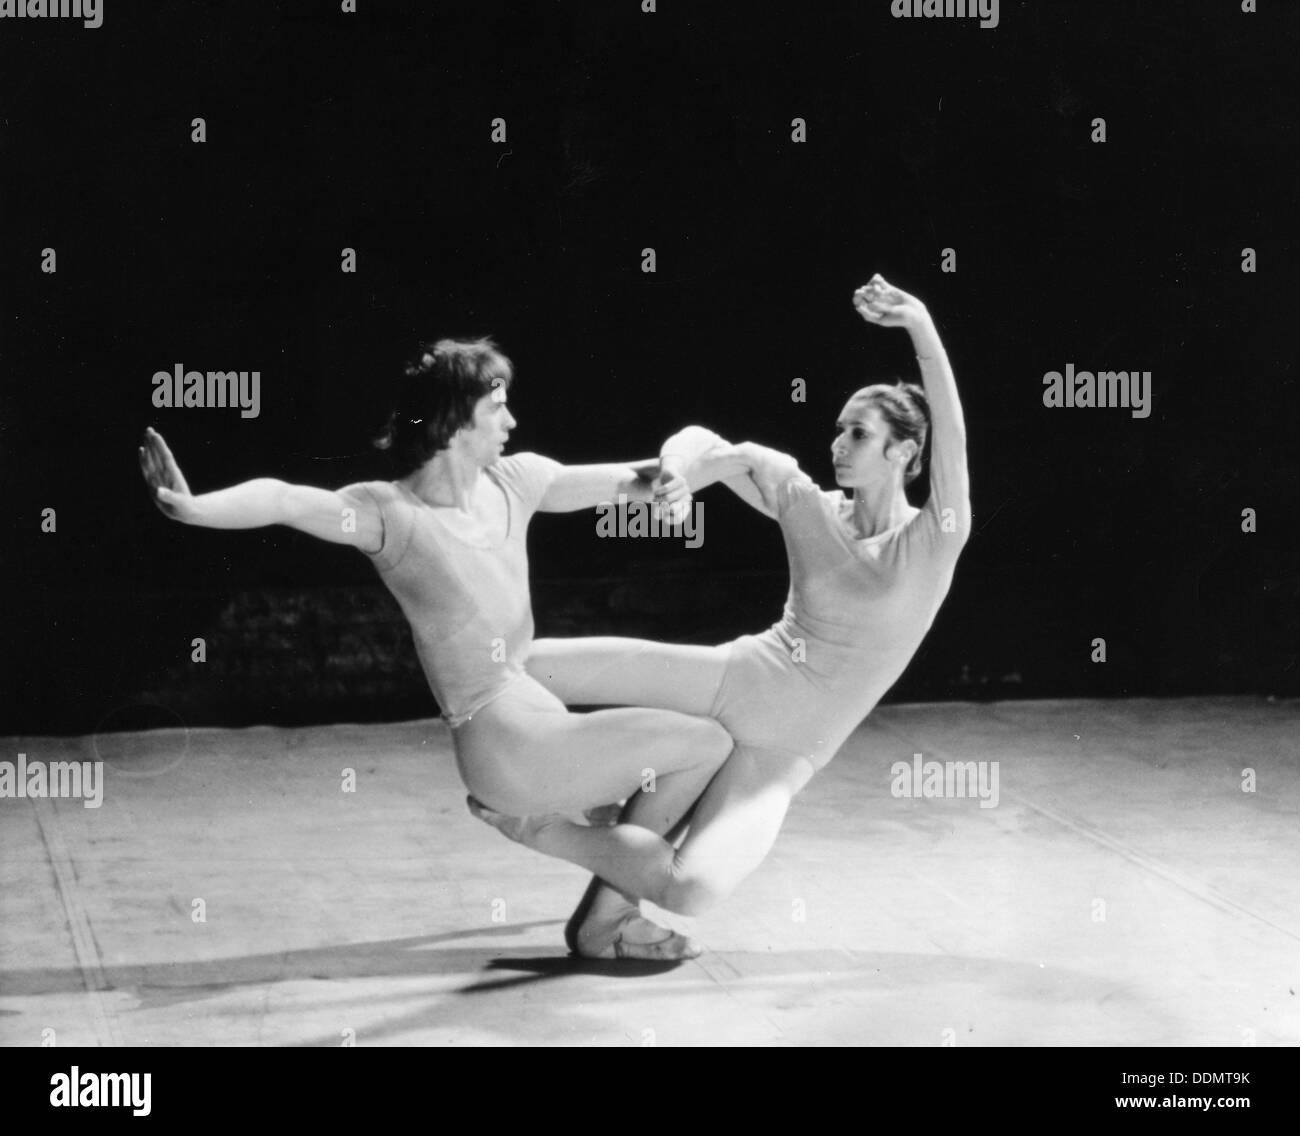 Rudolf Nureyev (1938-1993), Russian ballet dancer. - Stock Image